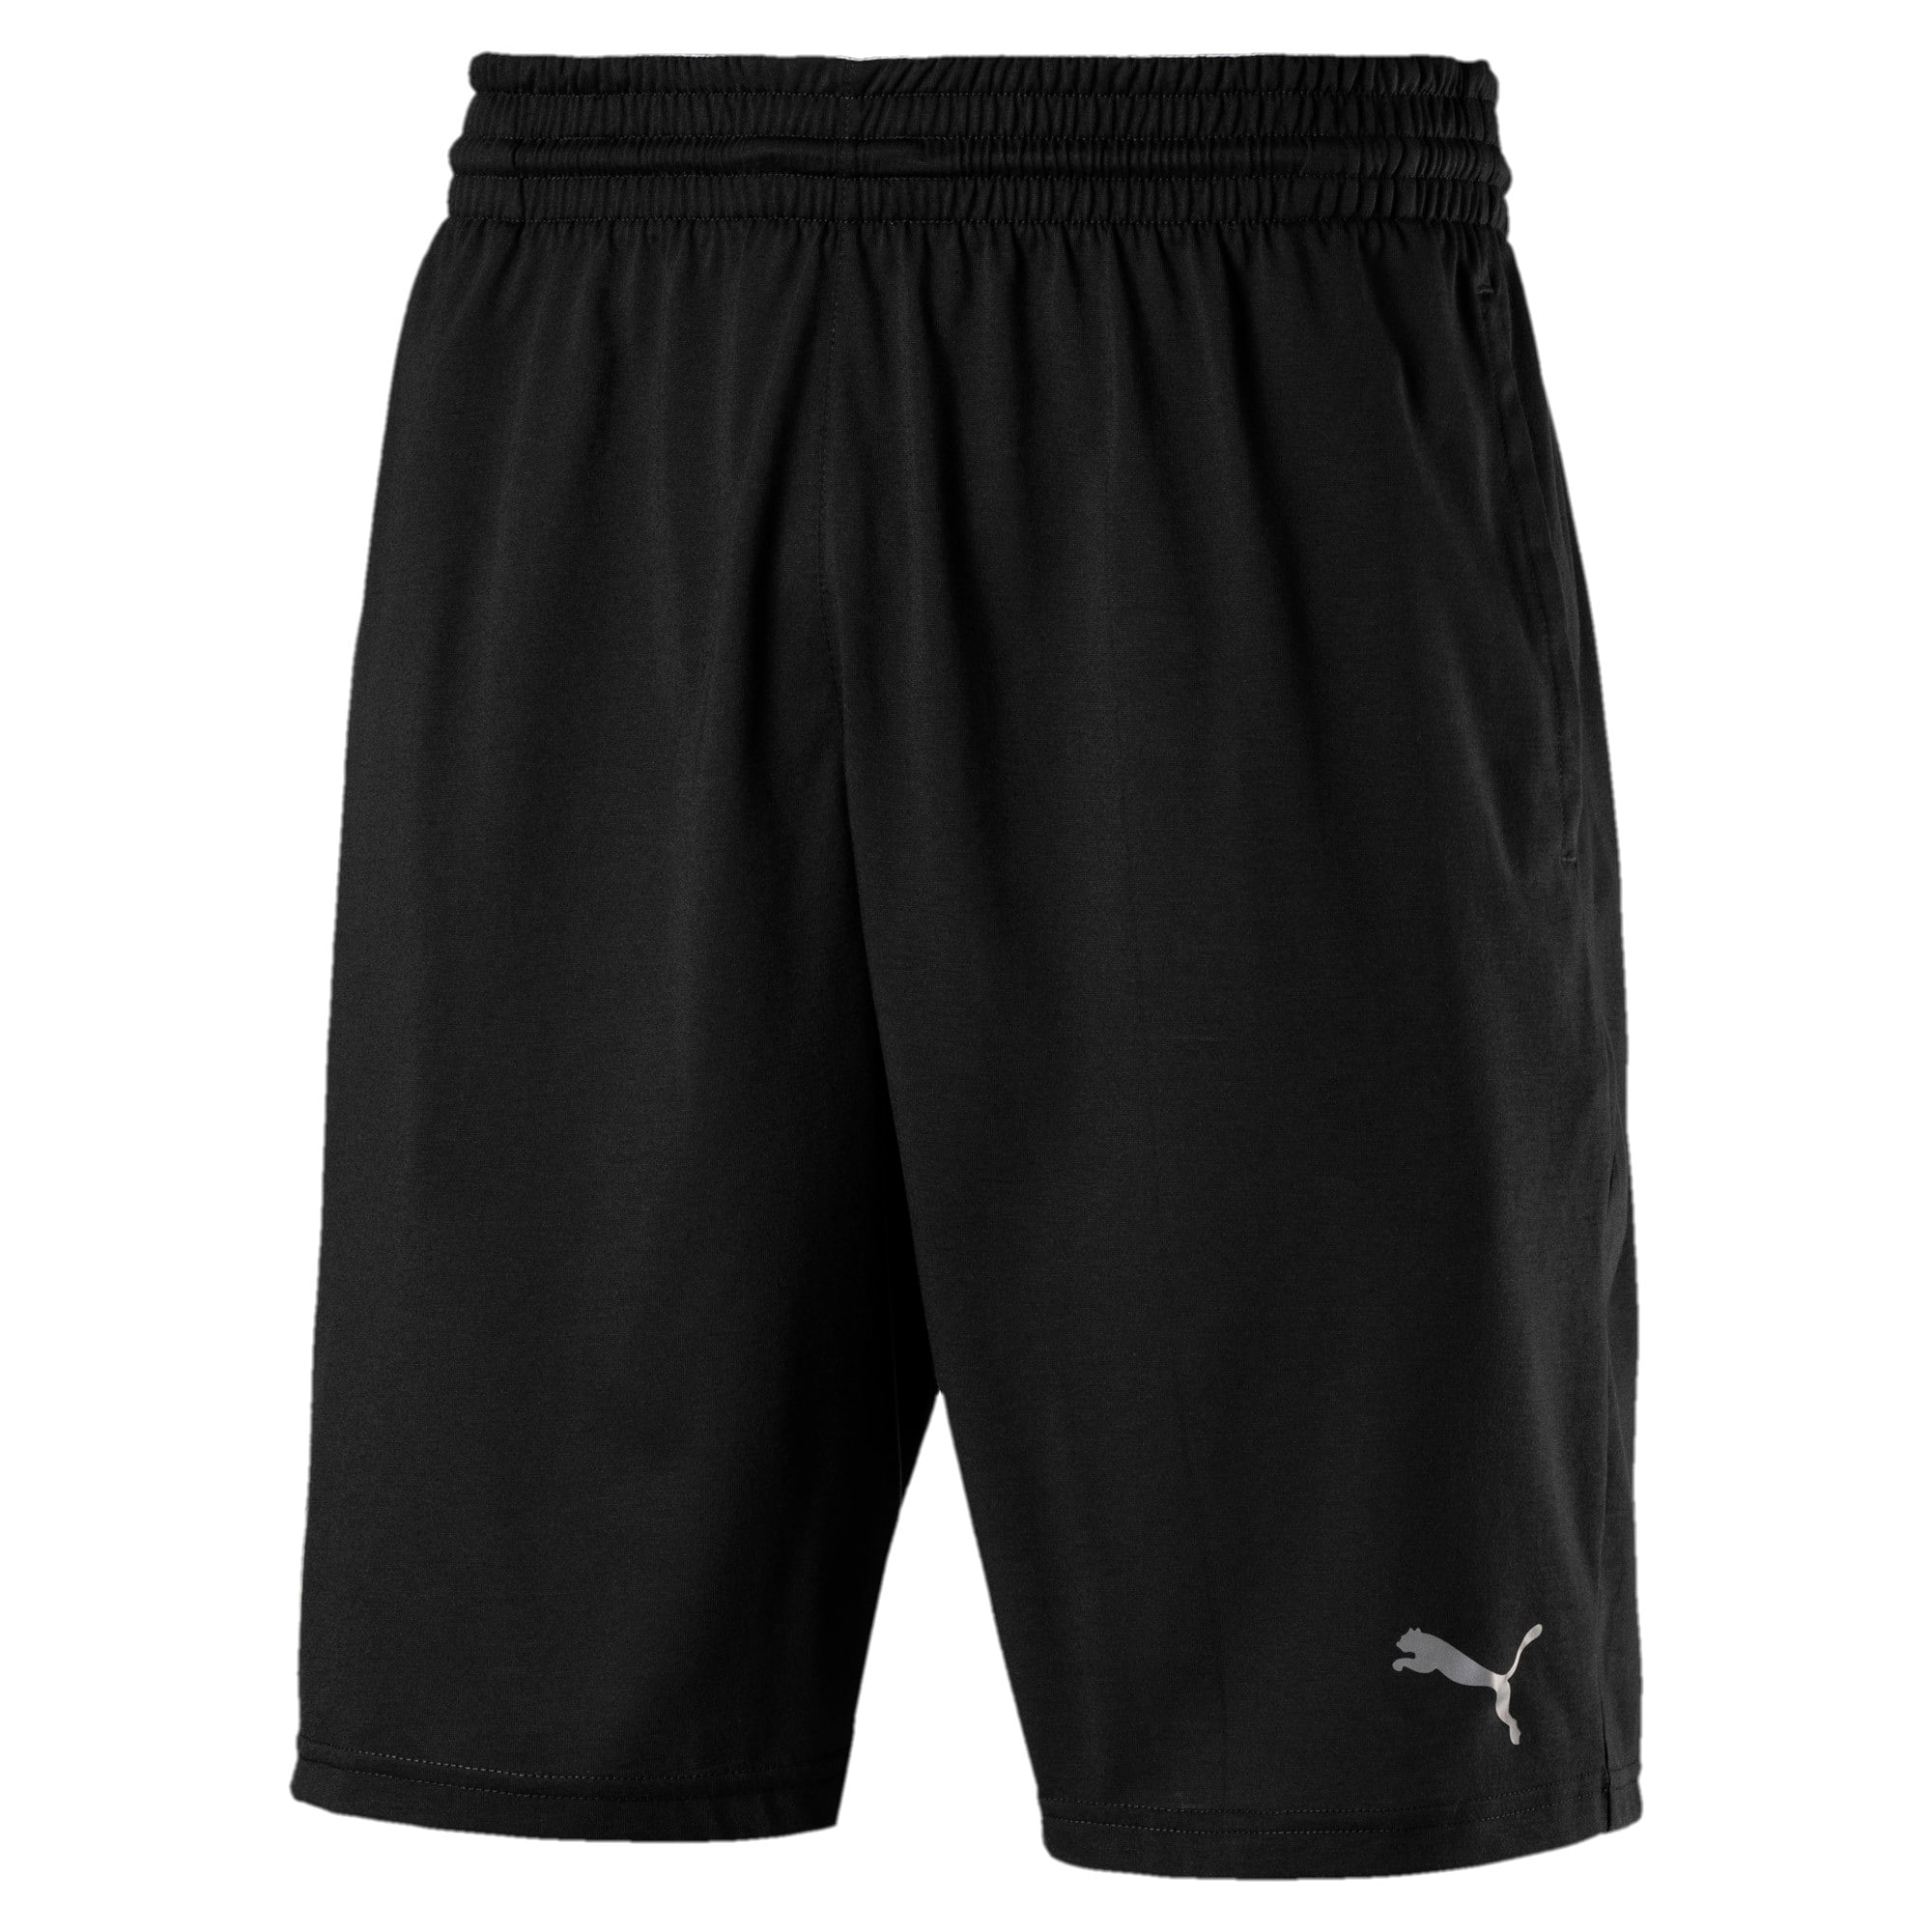 Thumbnail 4 of A.C.E. Knitted Men's Shorts, Puma Black, medium